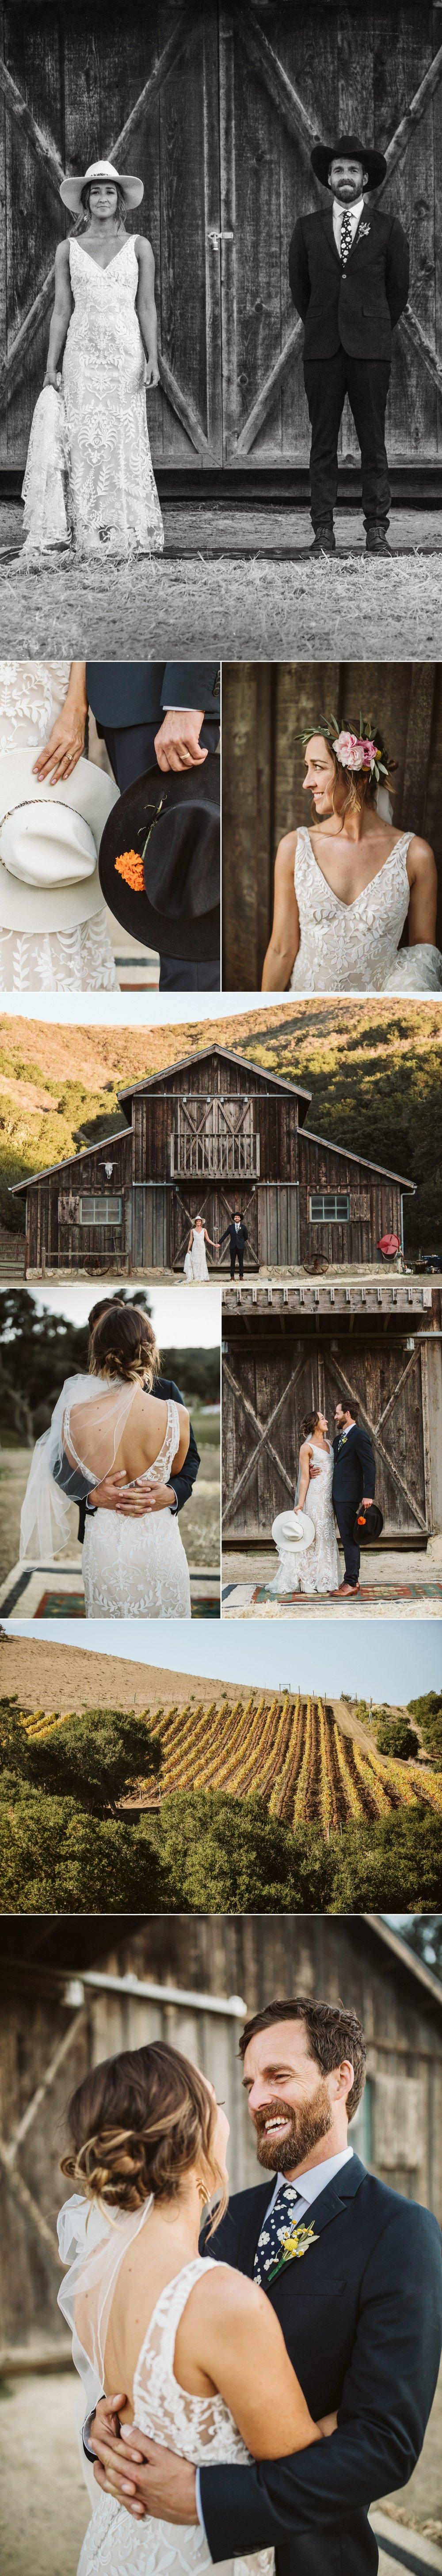 Colorful Barn Wedding at Jalama Canon Ranch- Lompoc- Santa Barbara- Geoff & Lauren 26.jpg